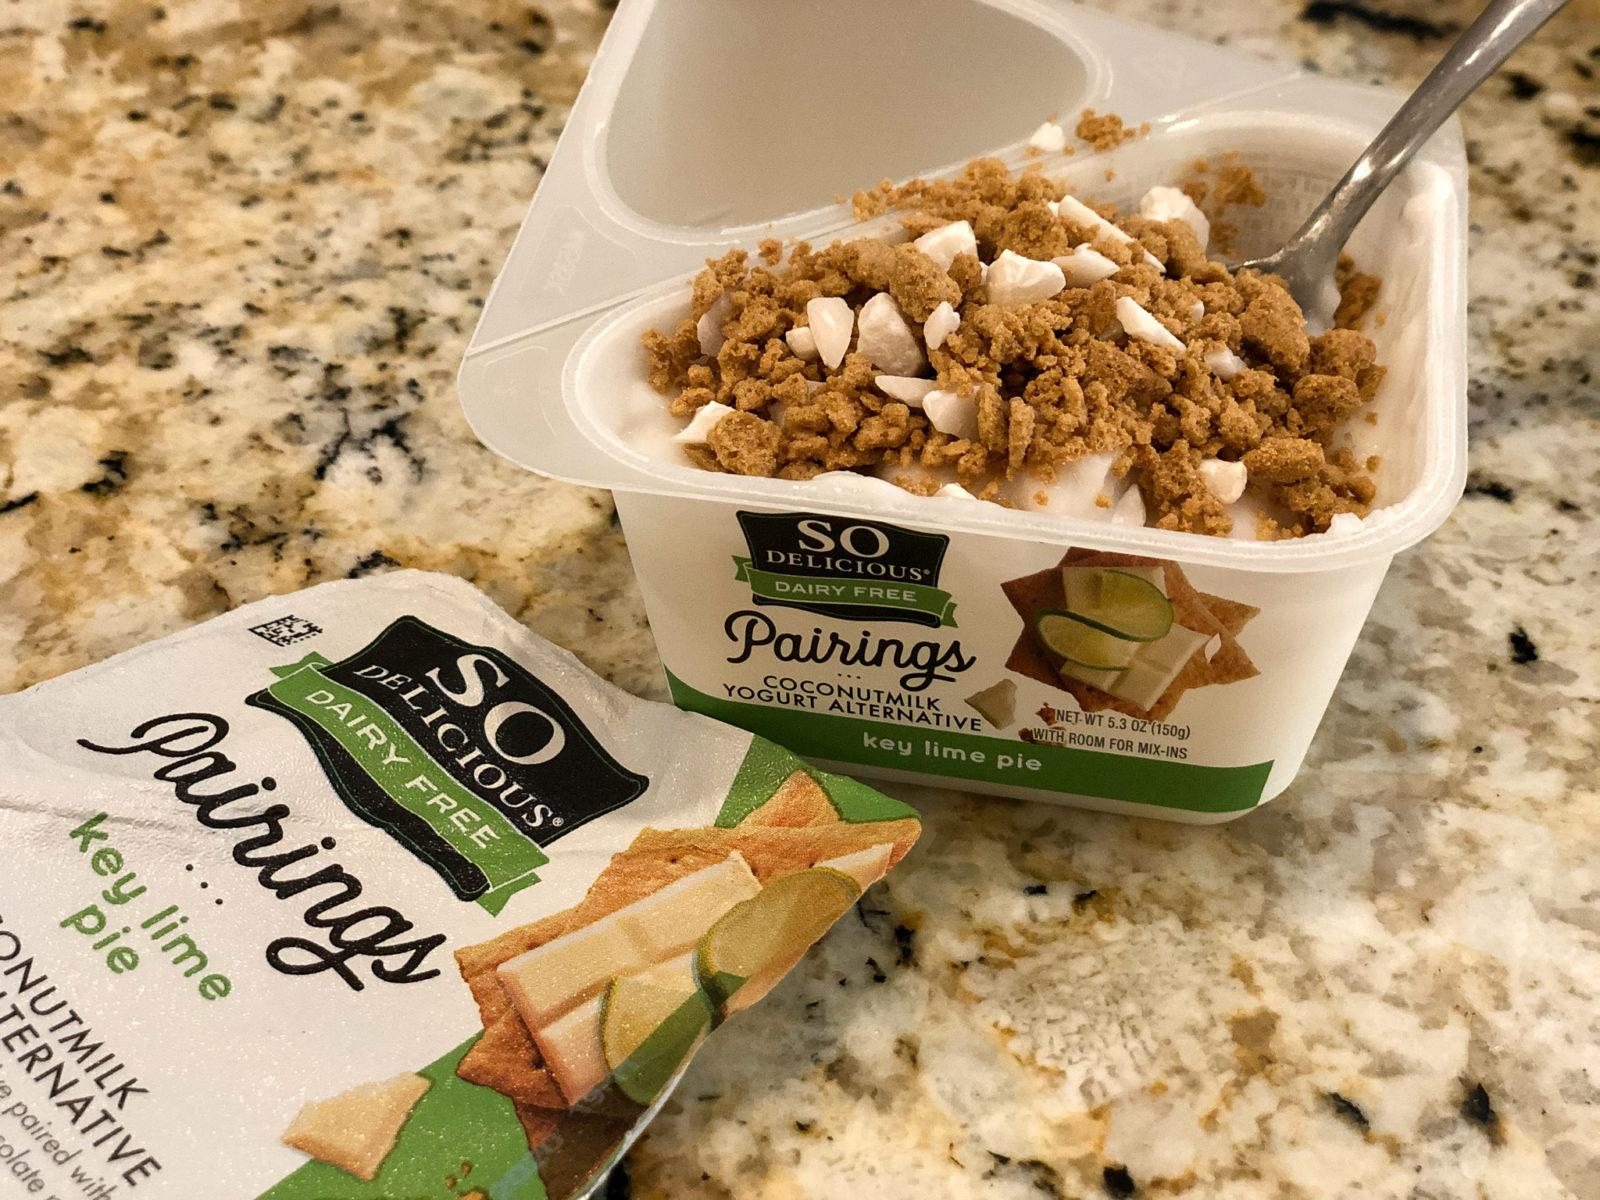 FREE So Delicious Pairings Yogurt Alternative At Kroger